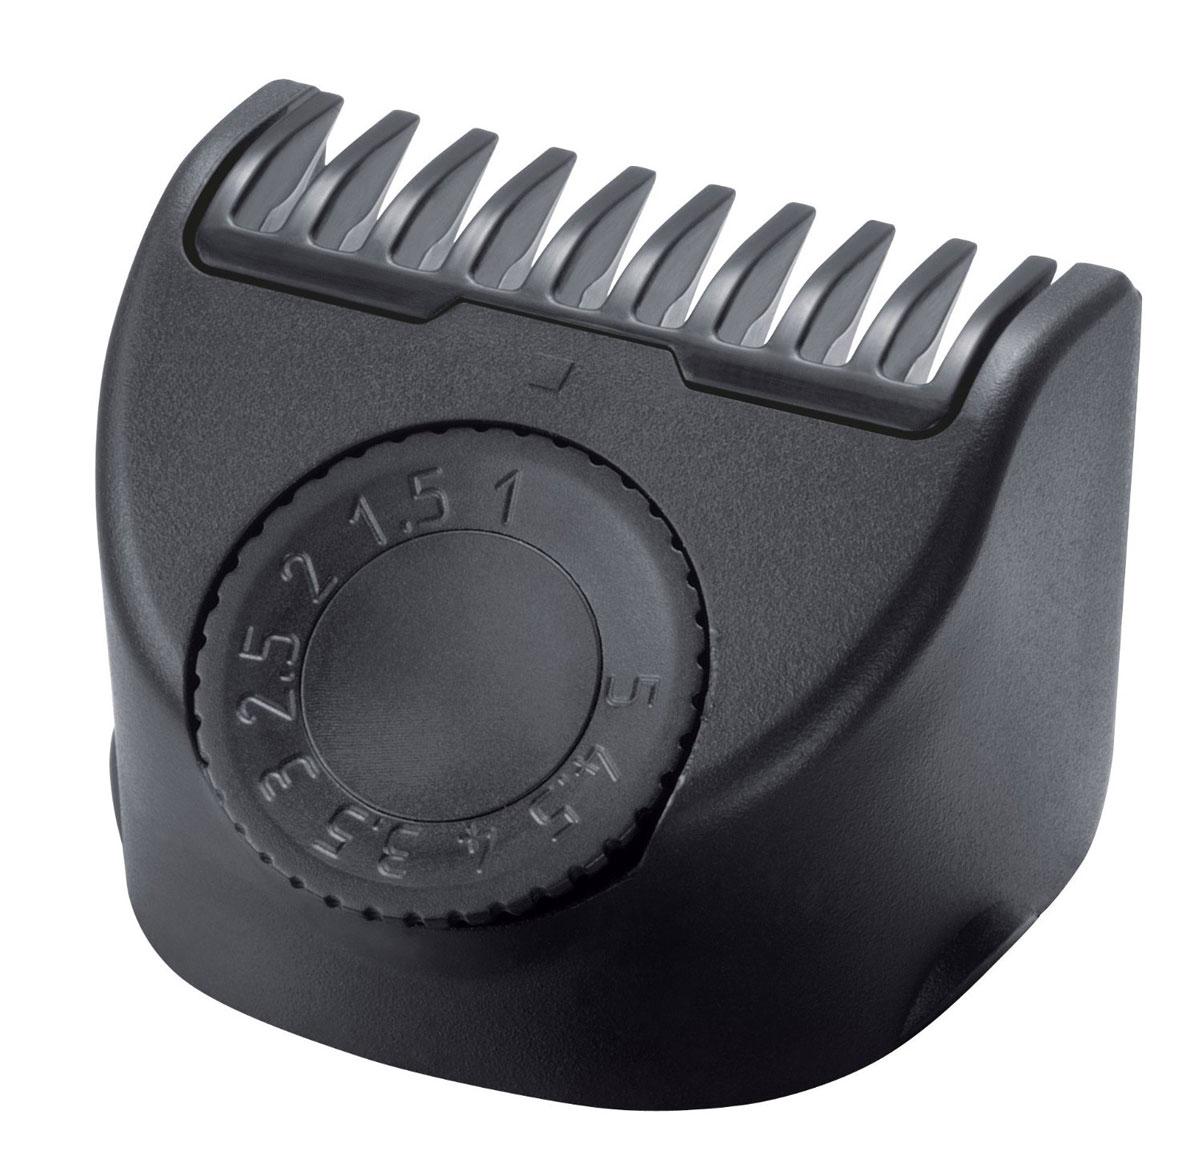 Remington MB4045 триммер для бороды